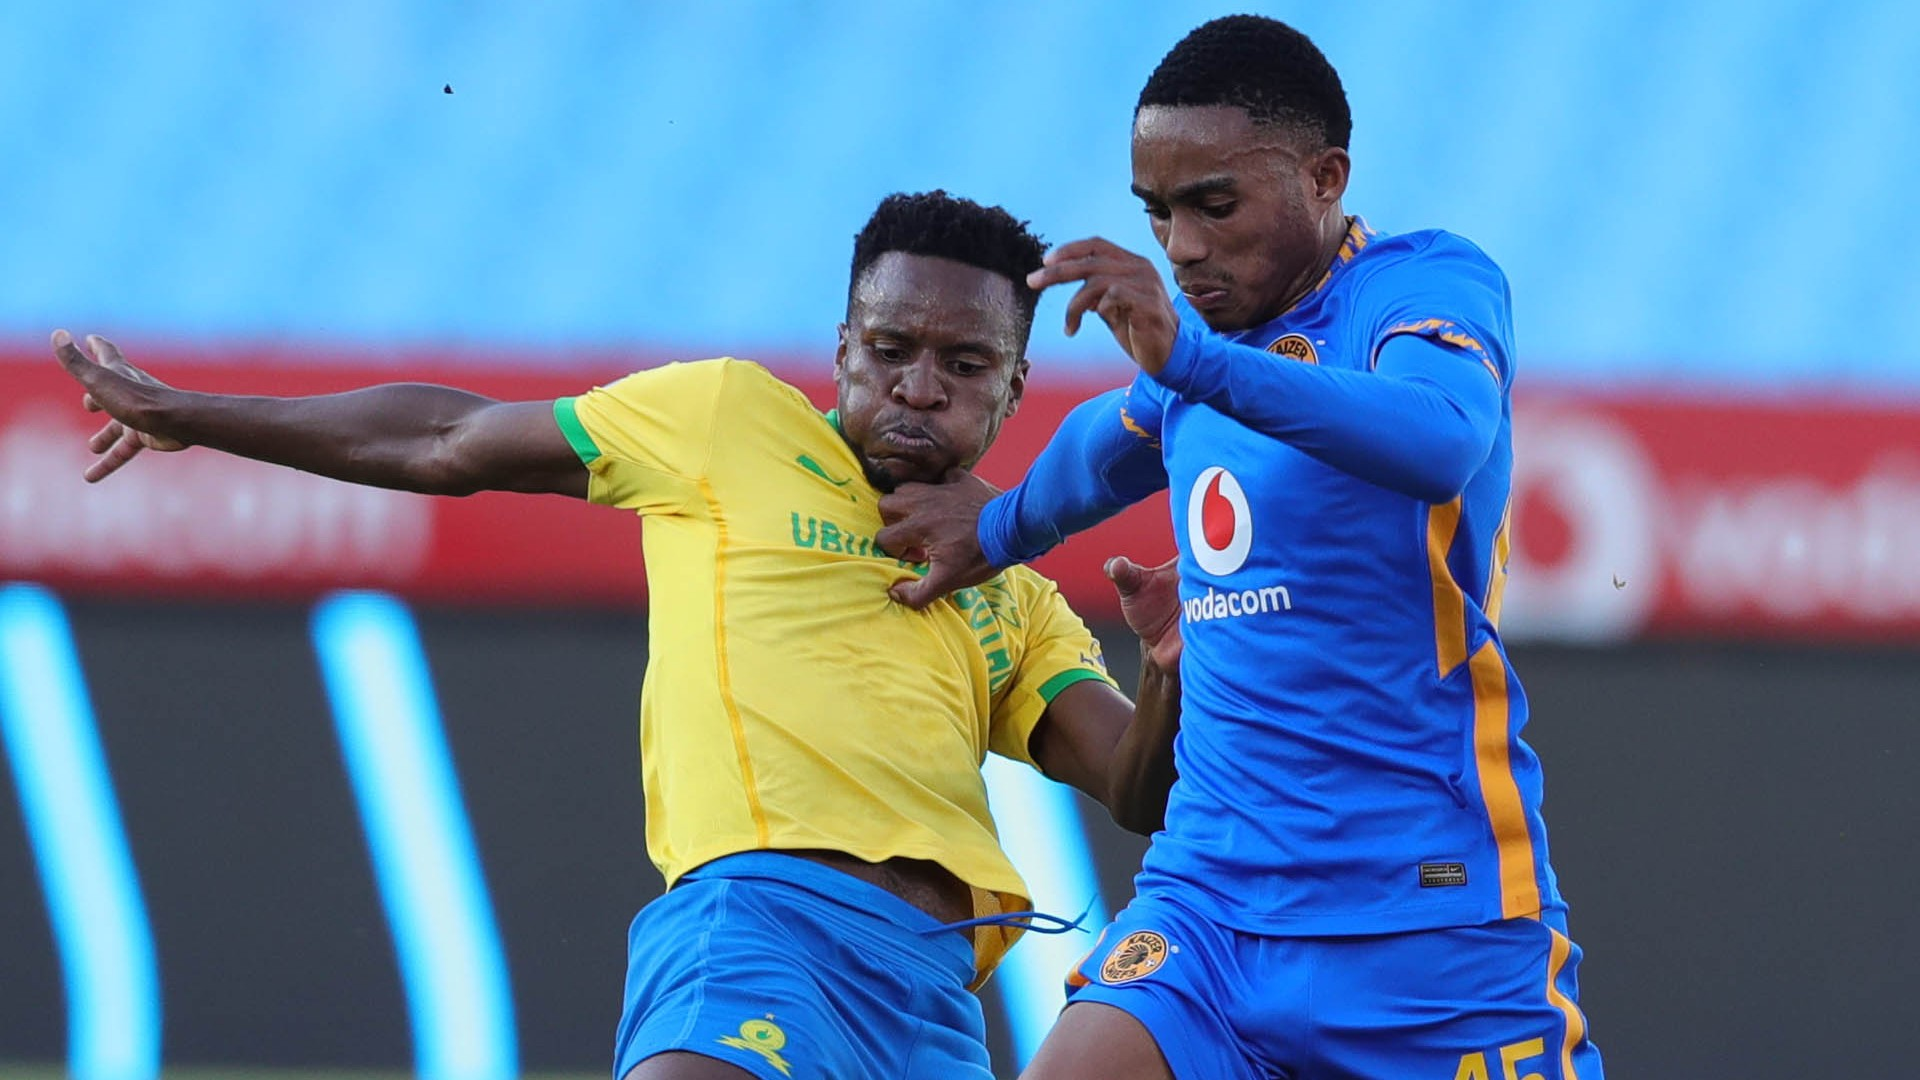 Mamelodi Sundowns and Kaizer Chiefs combined XI: Ngcobo, Zwane, Dolly